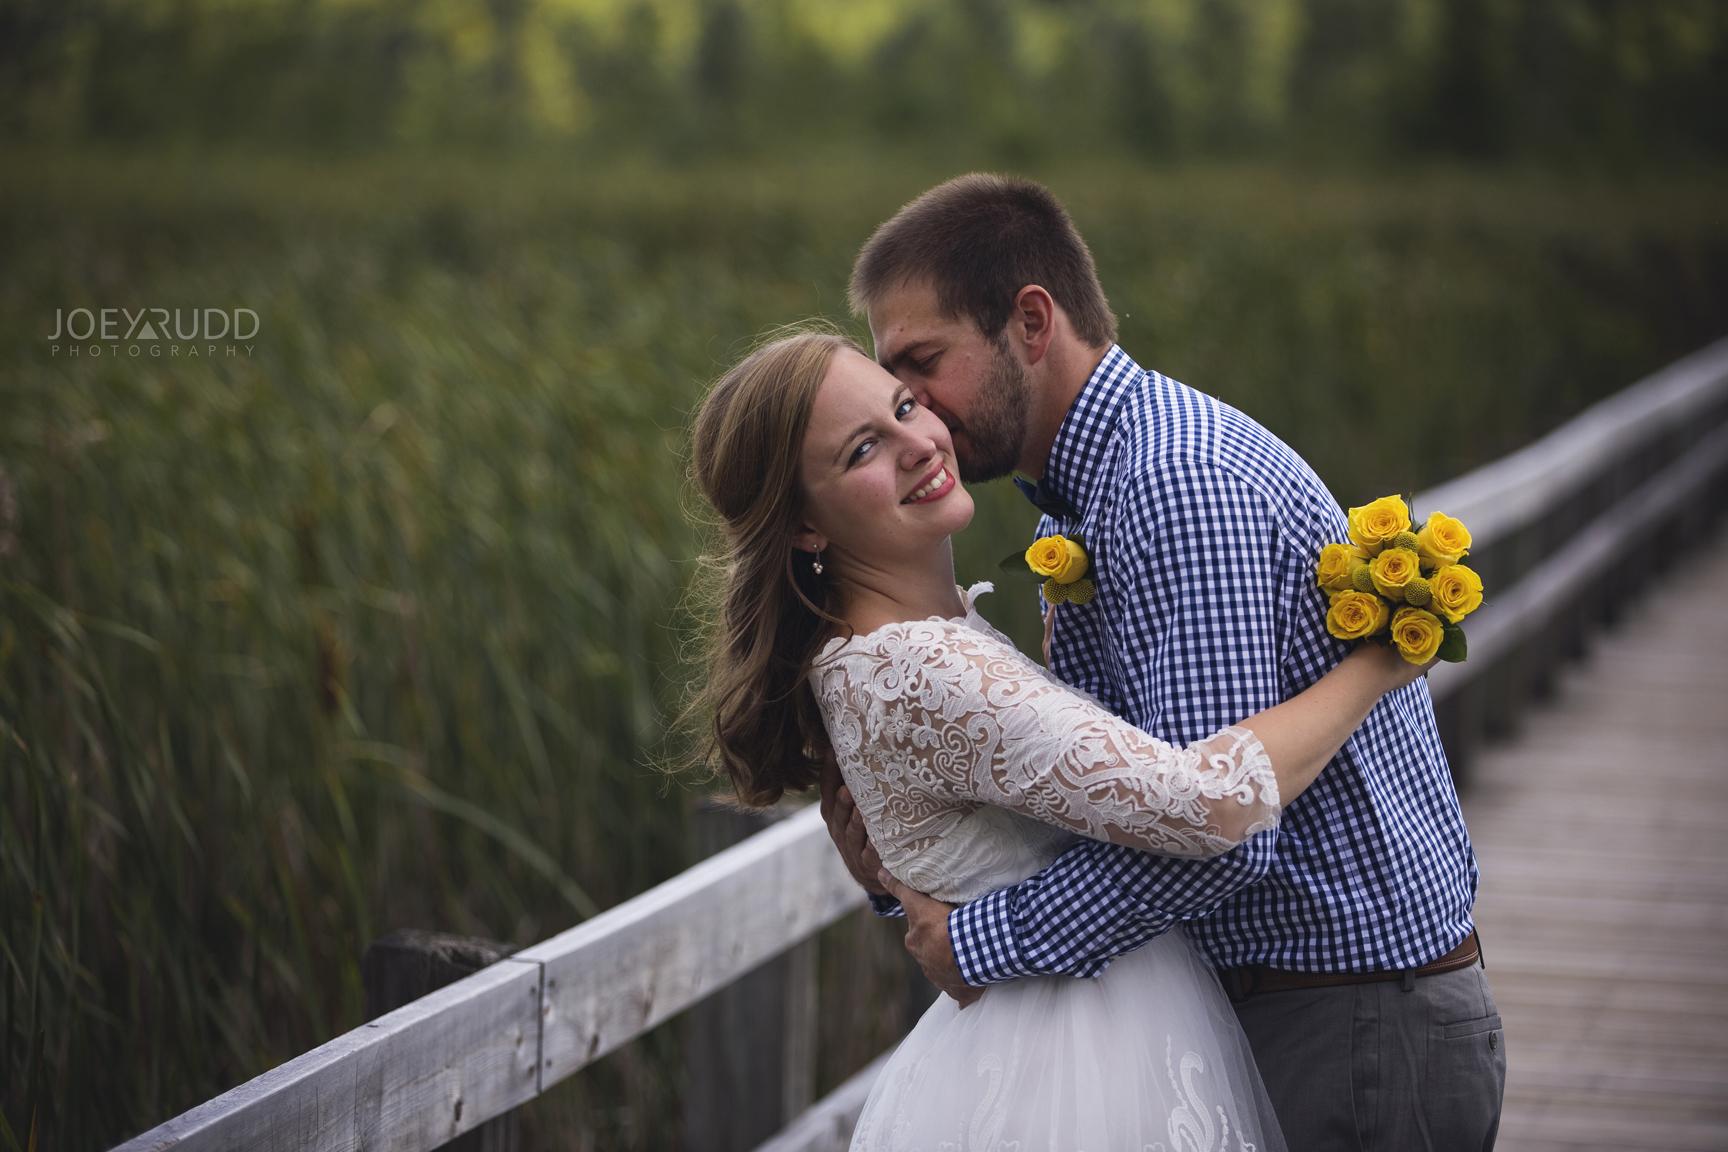 Ottawa Elopement by Joey Rudd Photography Ottawa Wedding Photographer Mer Bleue Ottawa Wedding Chapel Boardwalk Dip